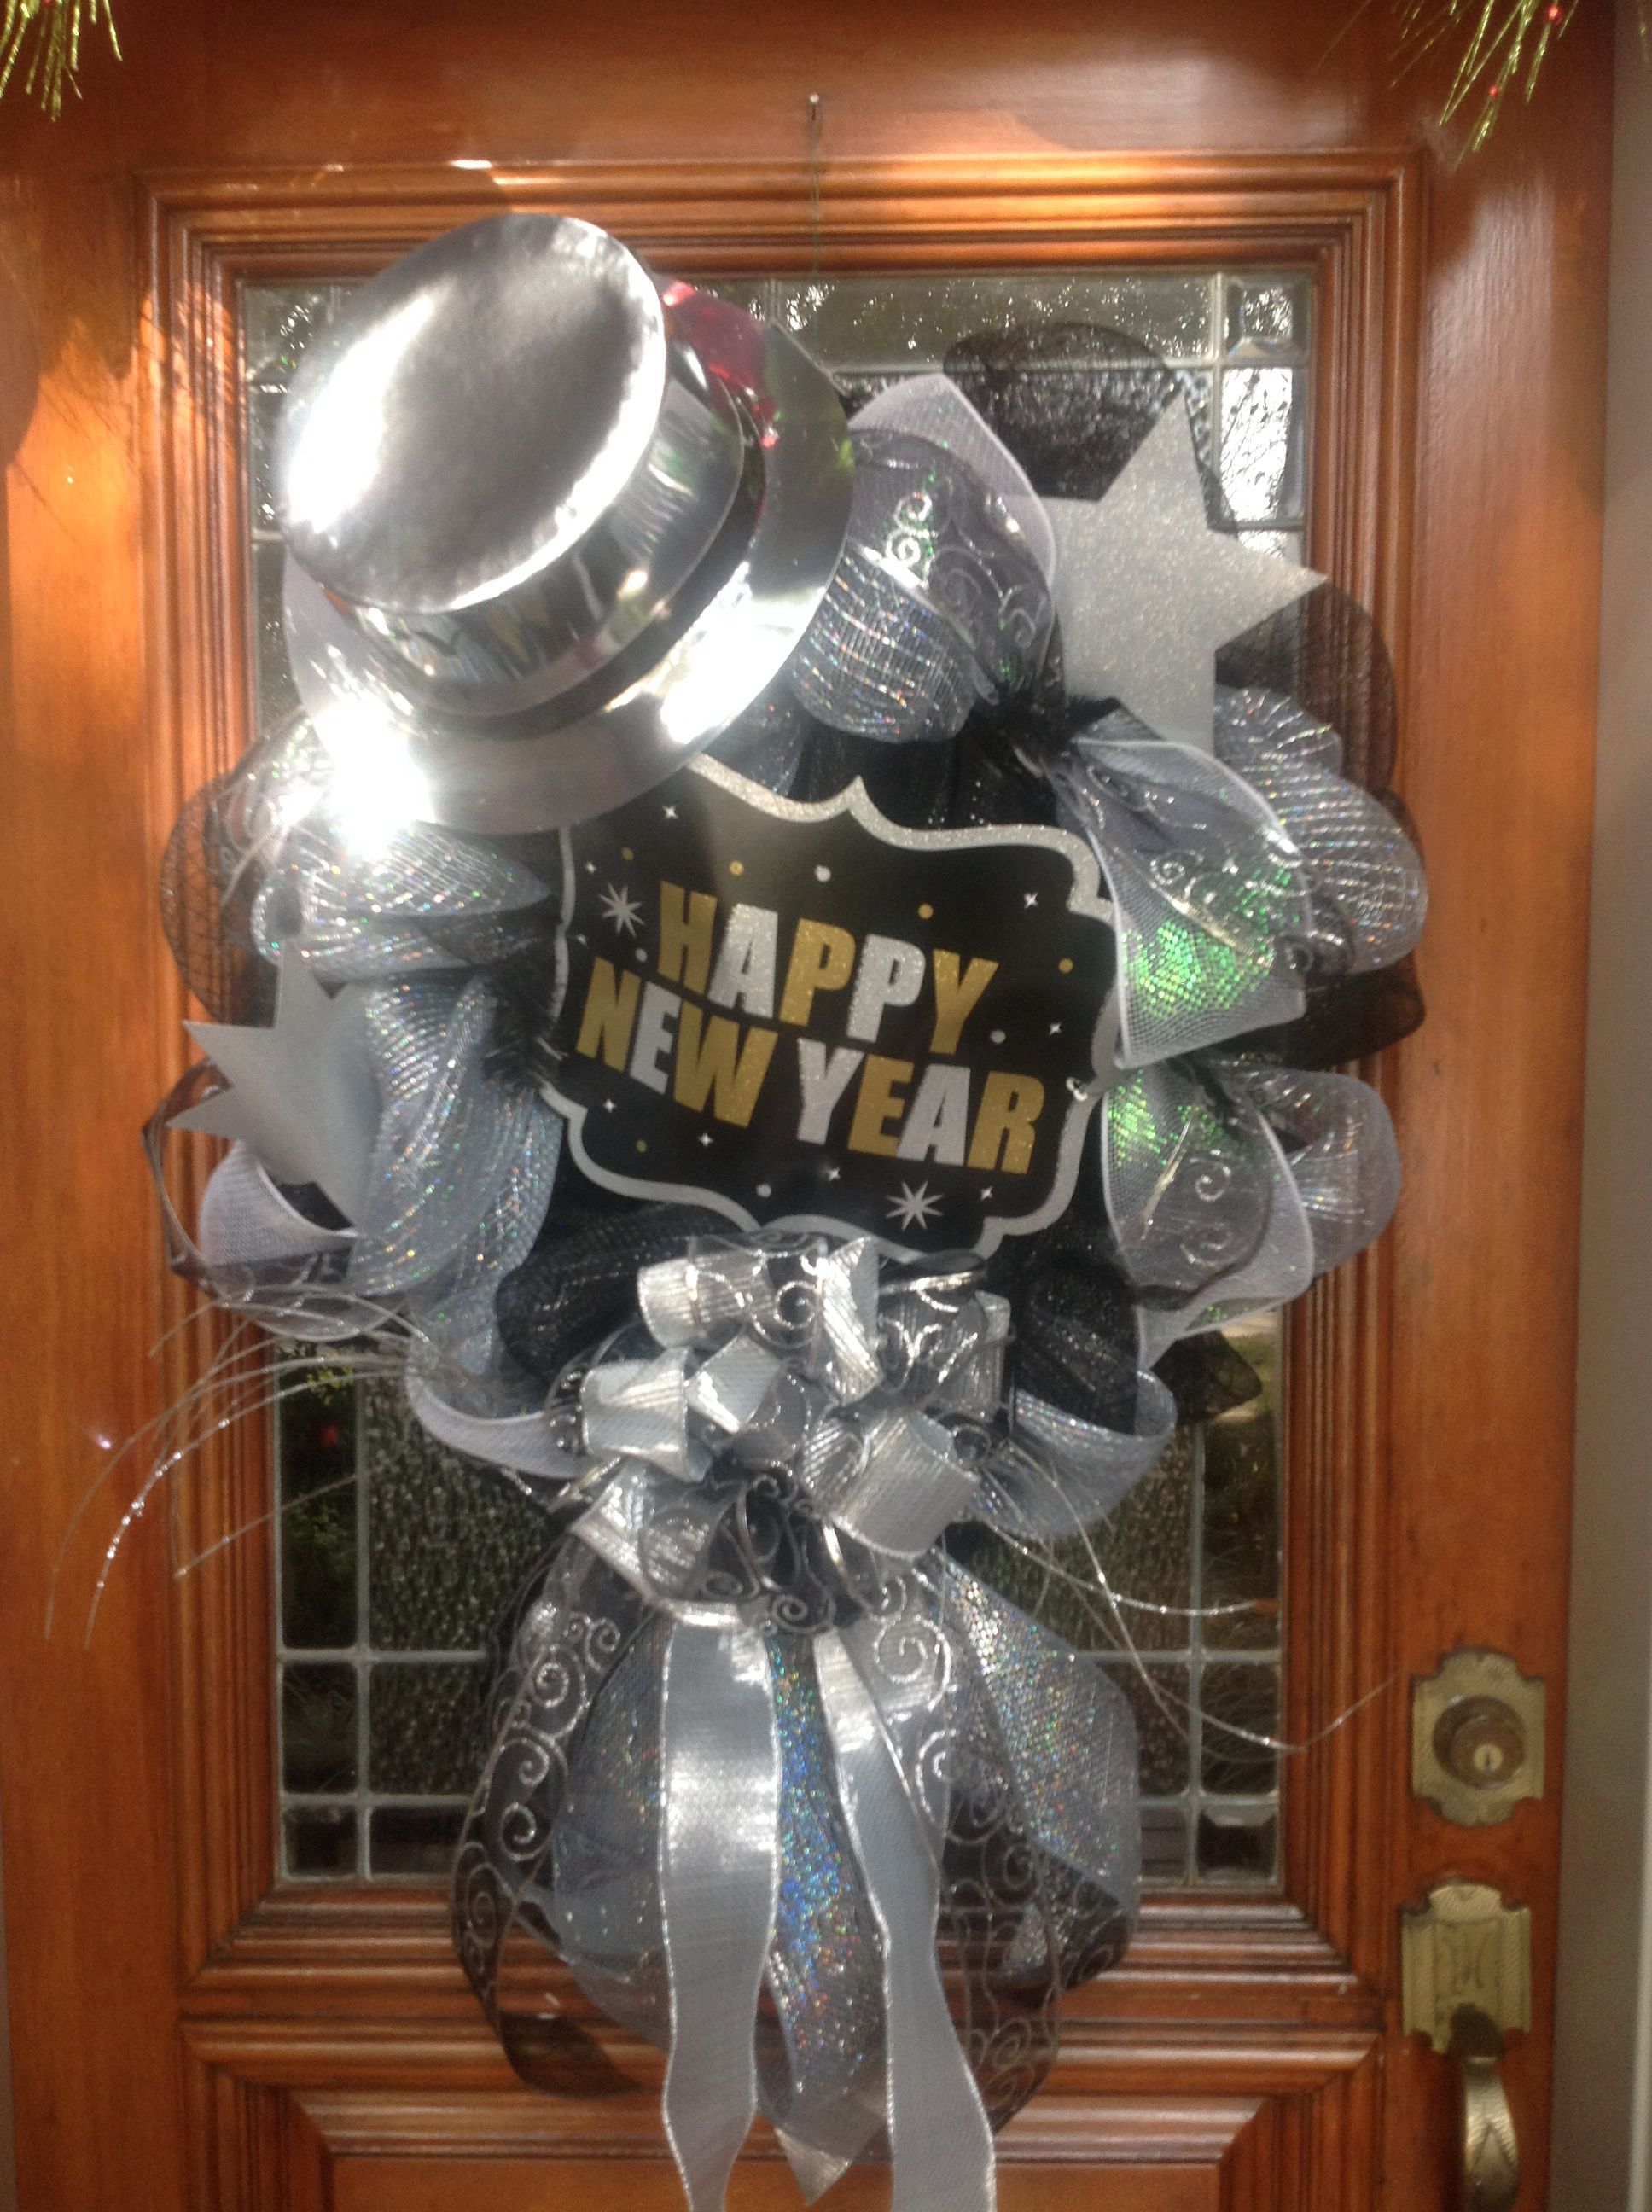 Deco mesh New year's Wreath Christmas mesh wreaths